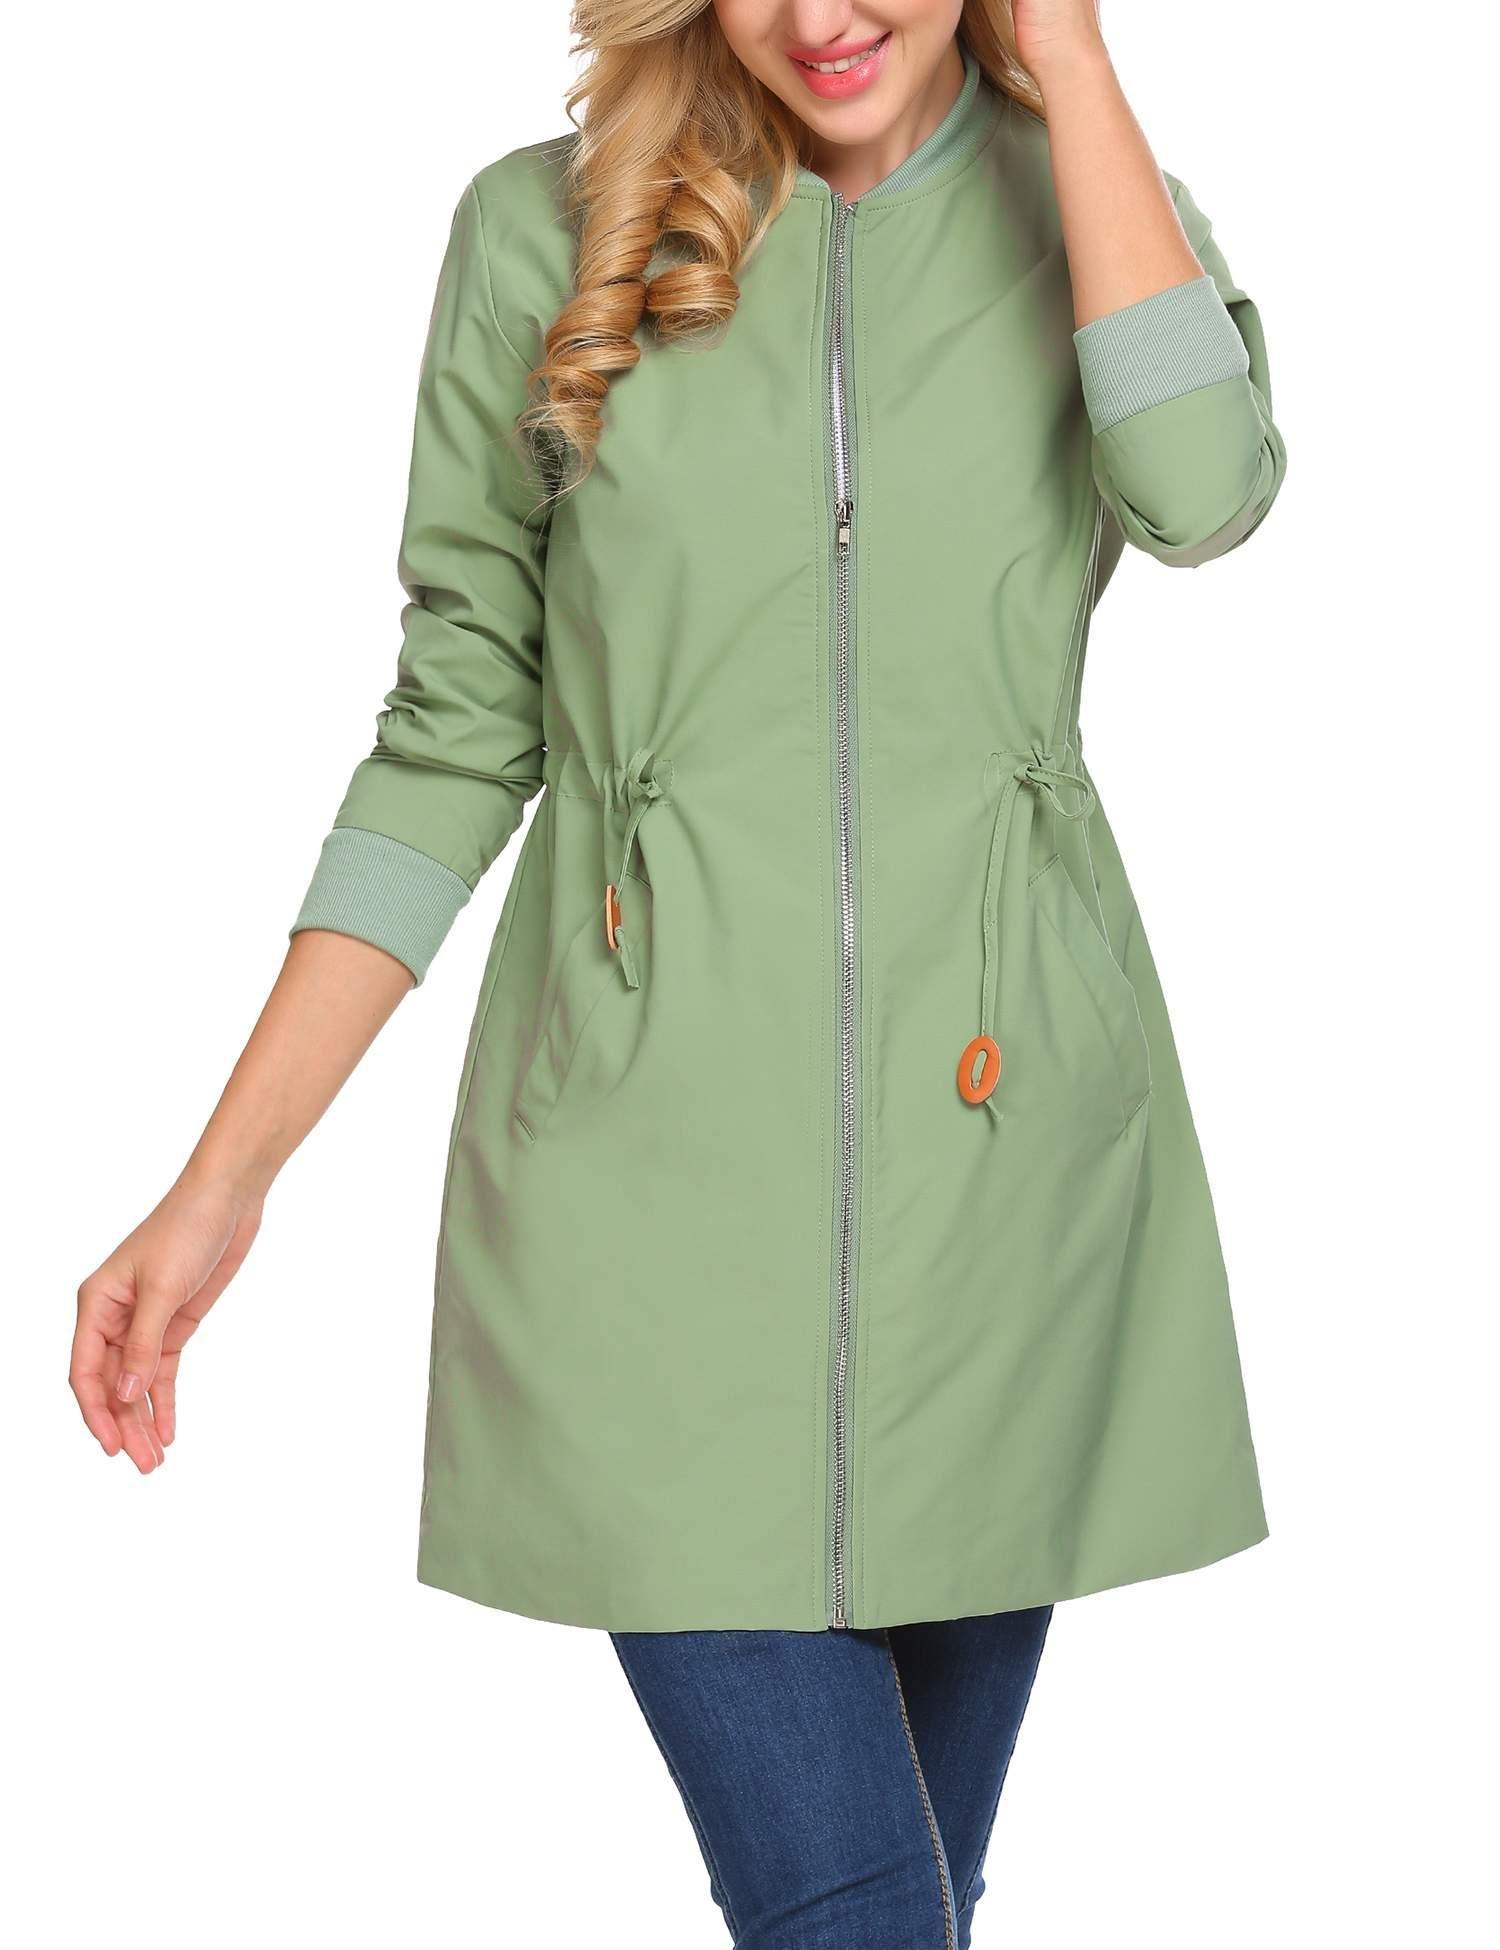 ELESOL Women's New Style Winter Spring Biker Bomber Jacket Slim Stand Collar Coat Green/S